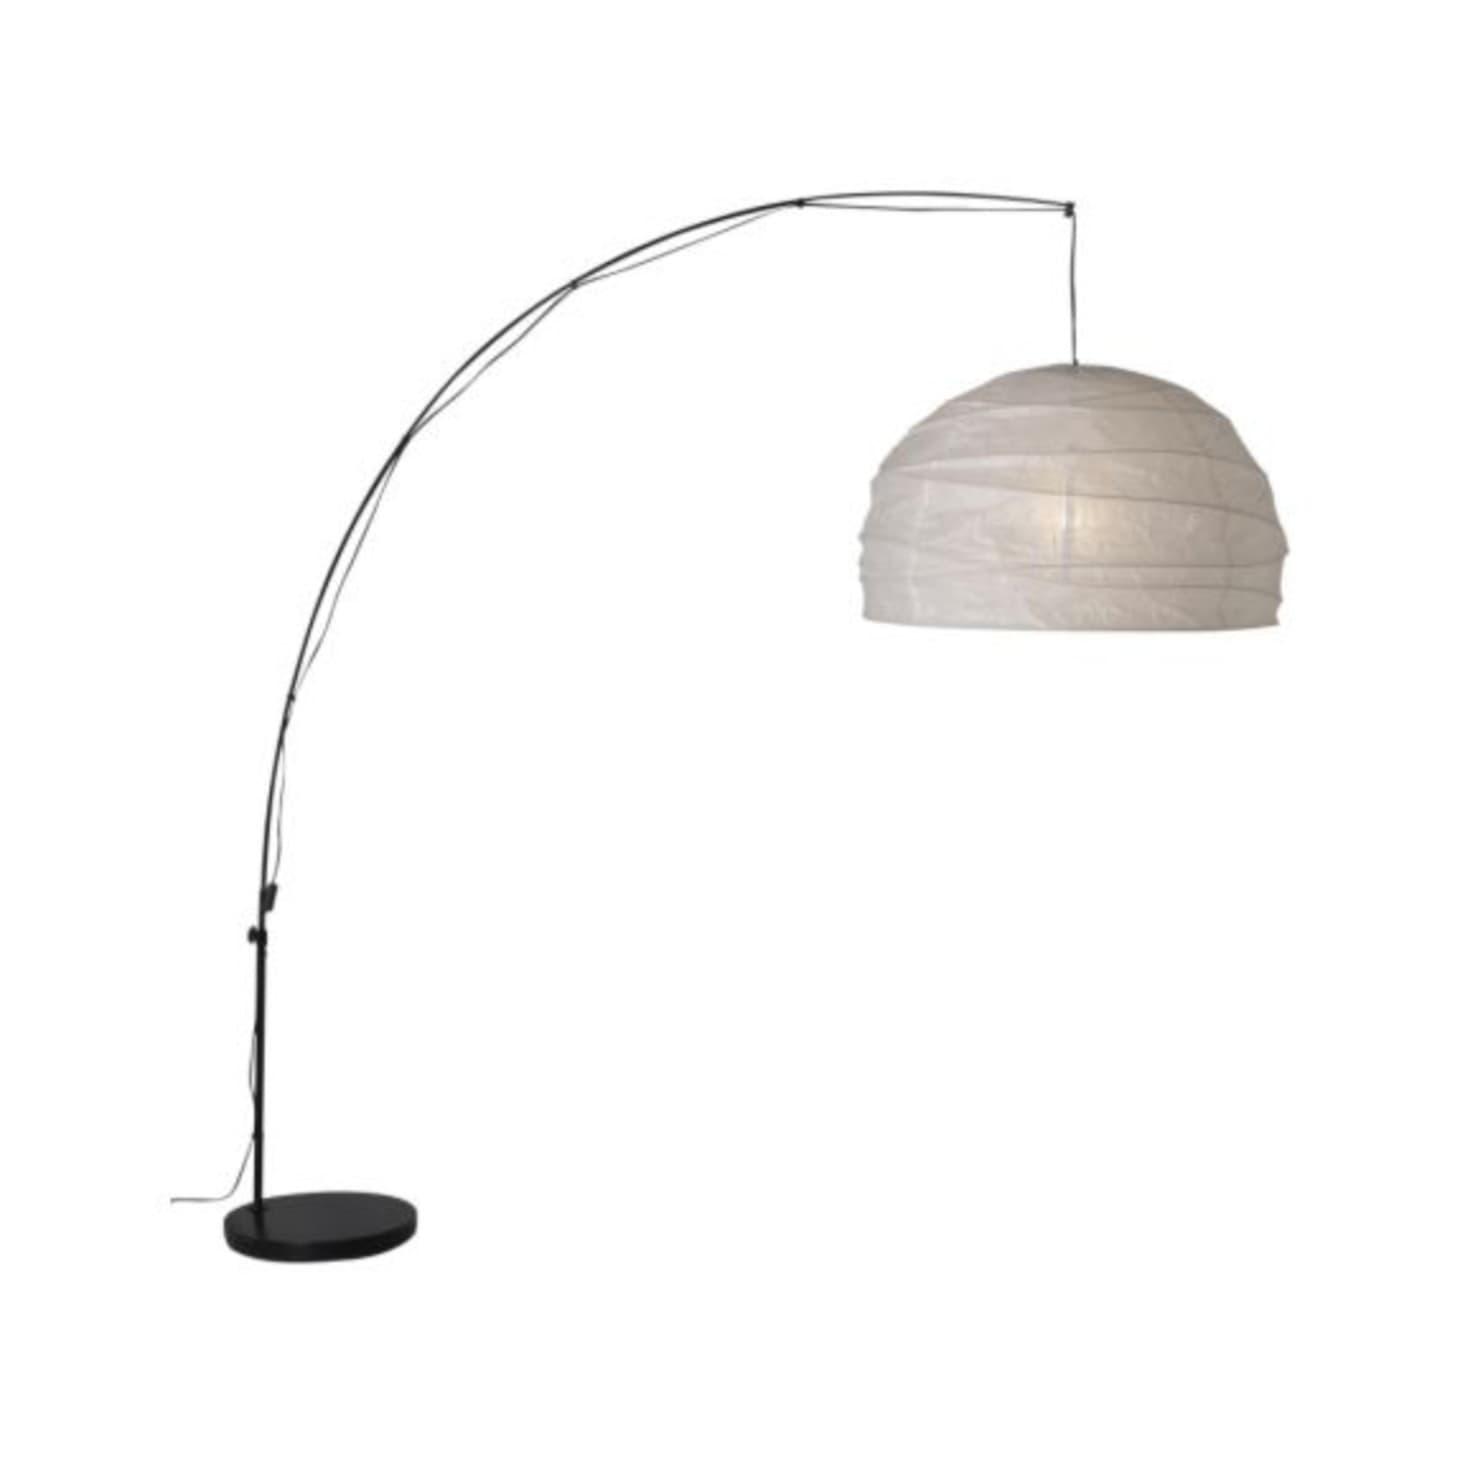 Ikea Floor Lamp 3 Bulbs - Test 7